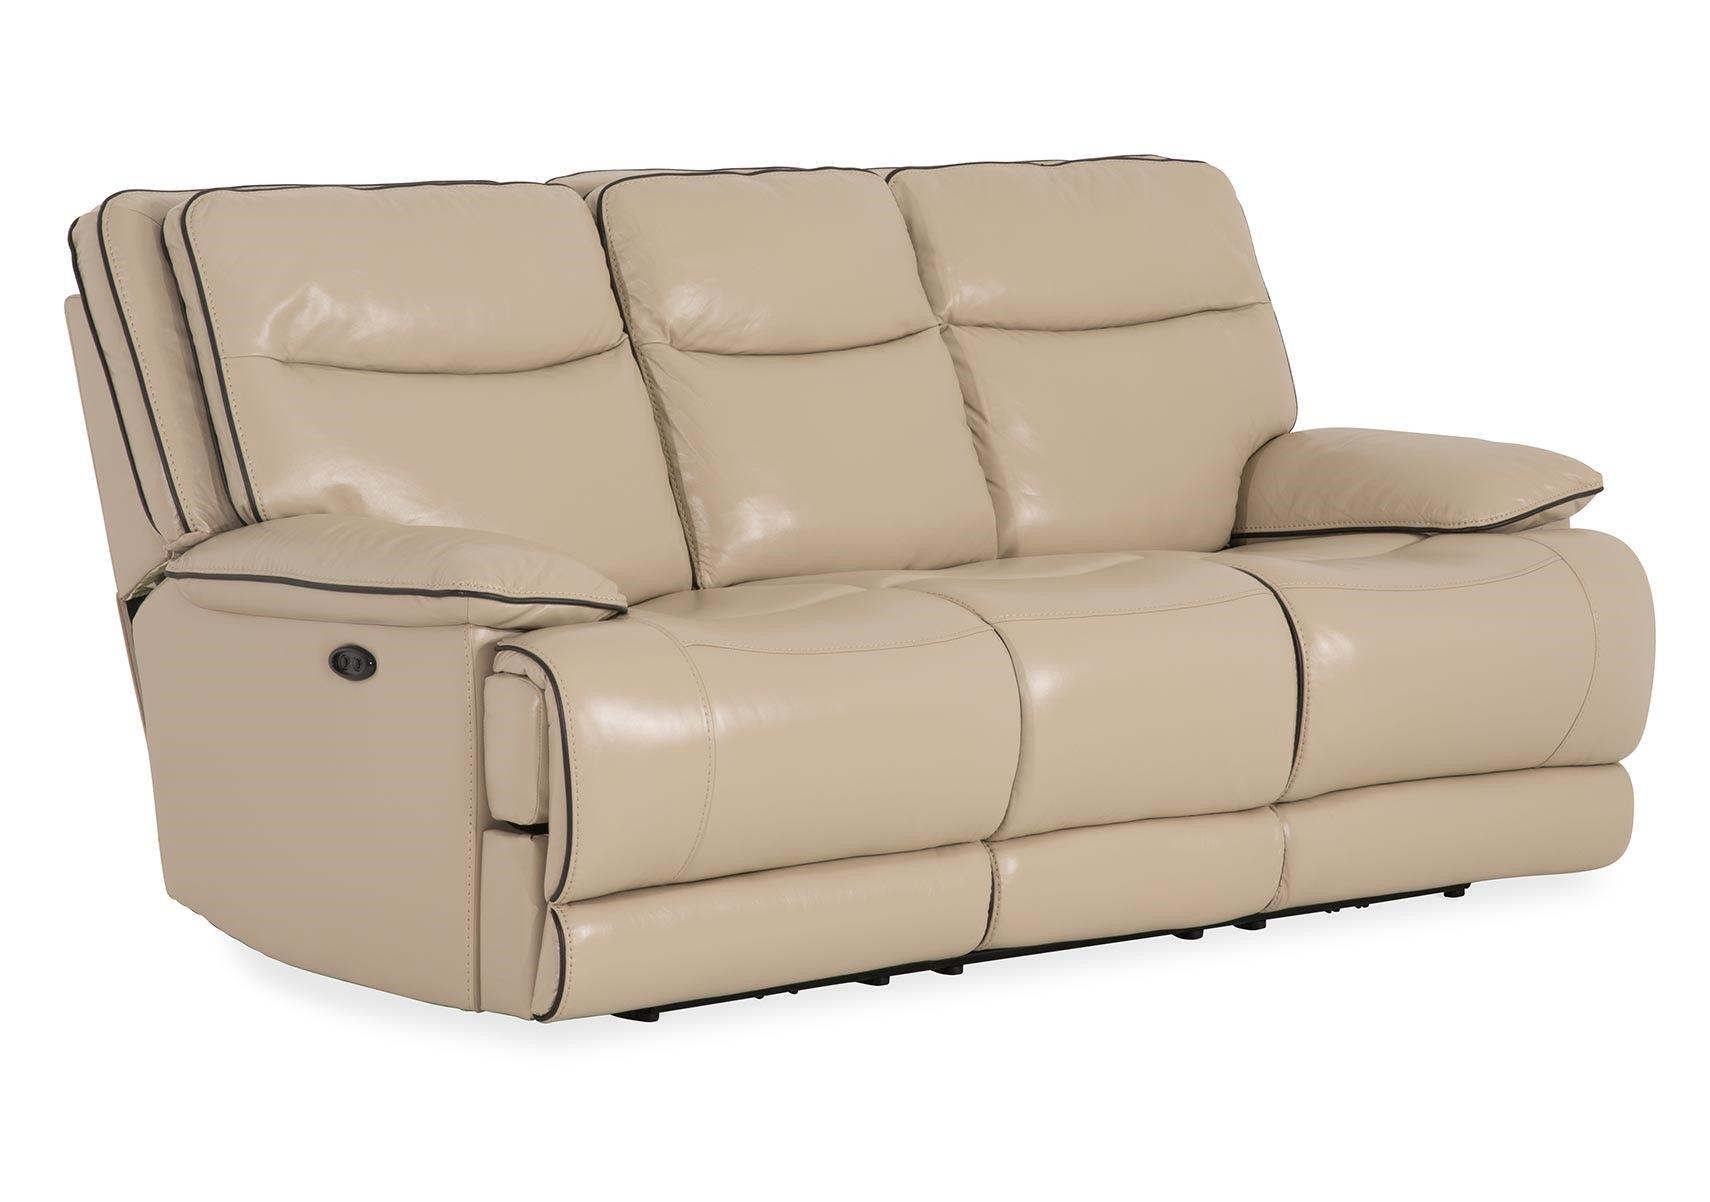 Lacks Owen Dual Reclining Sofa